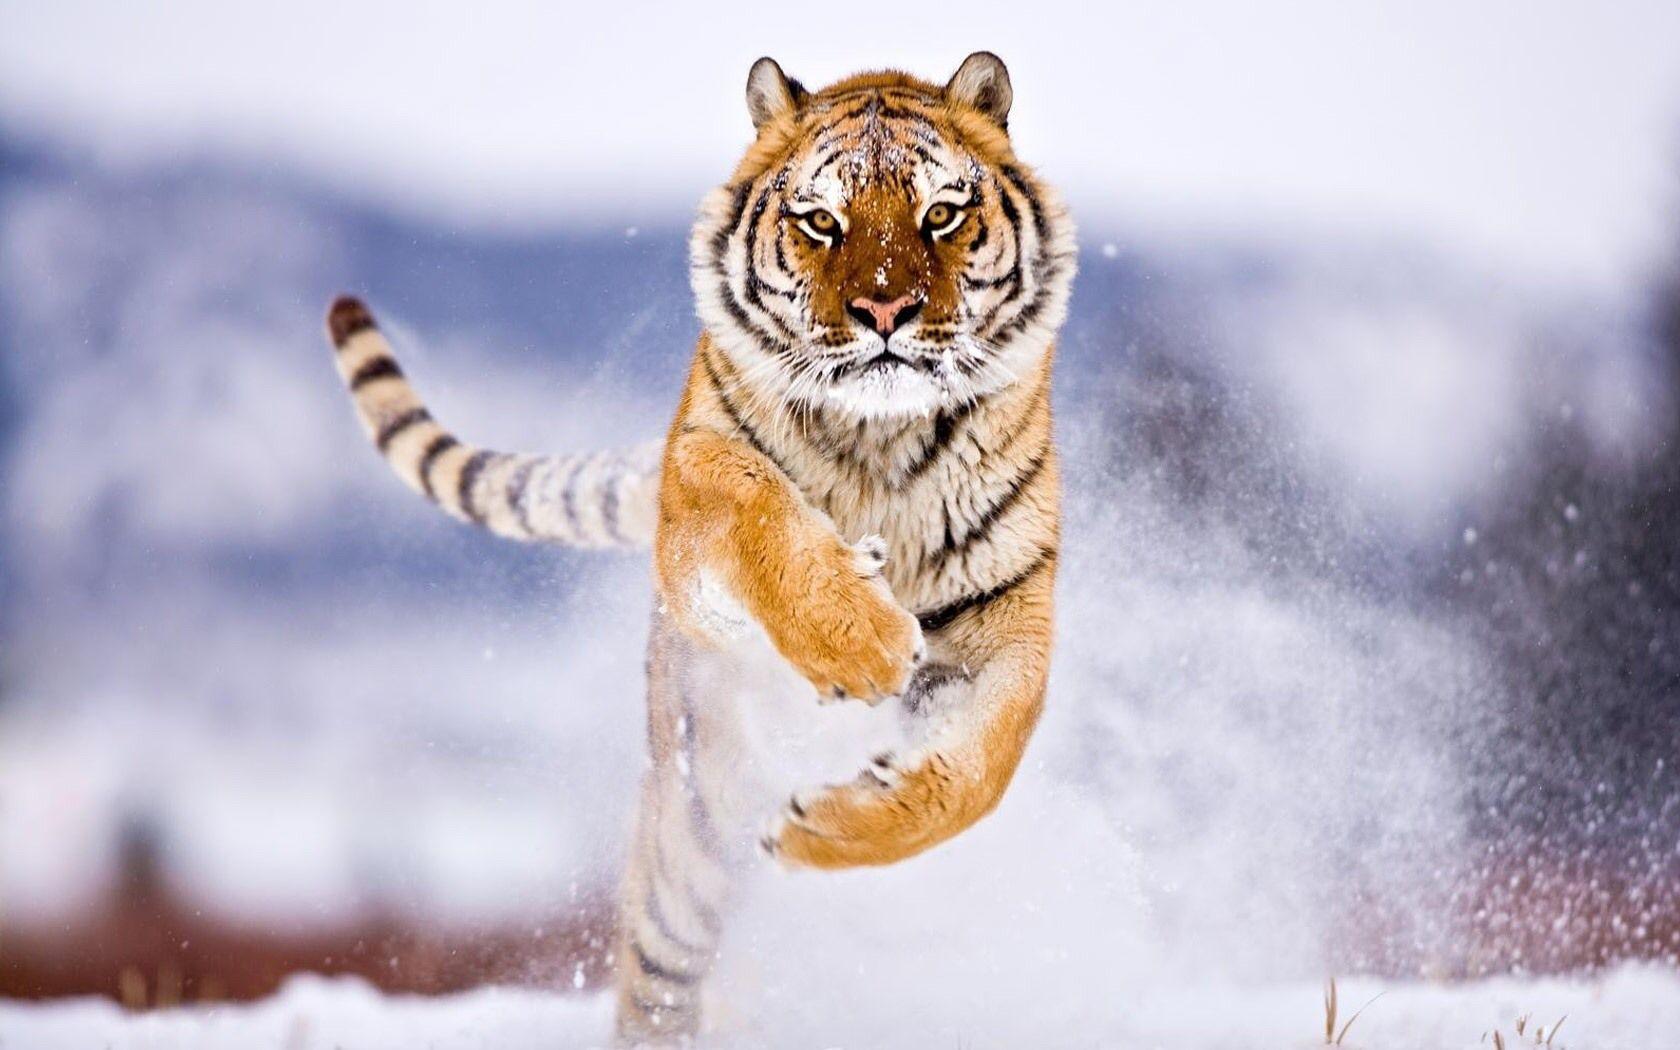 104 Gambar Binatang Paling Keren HD Terbaru